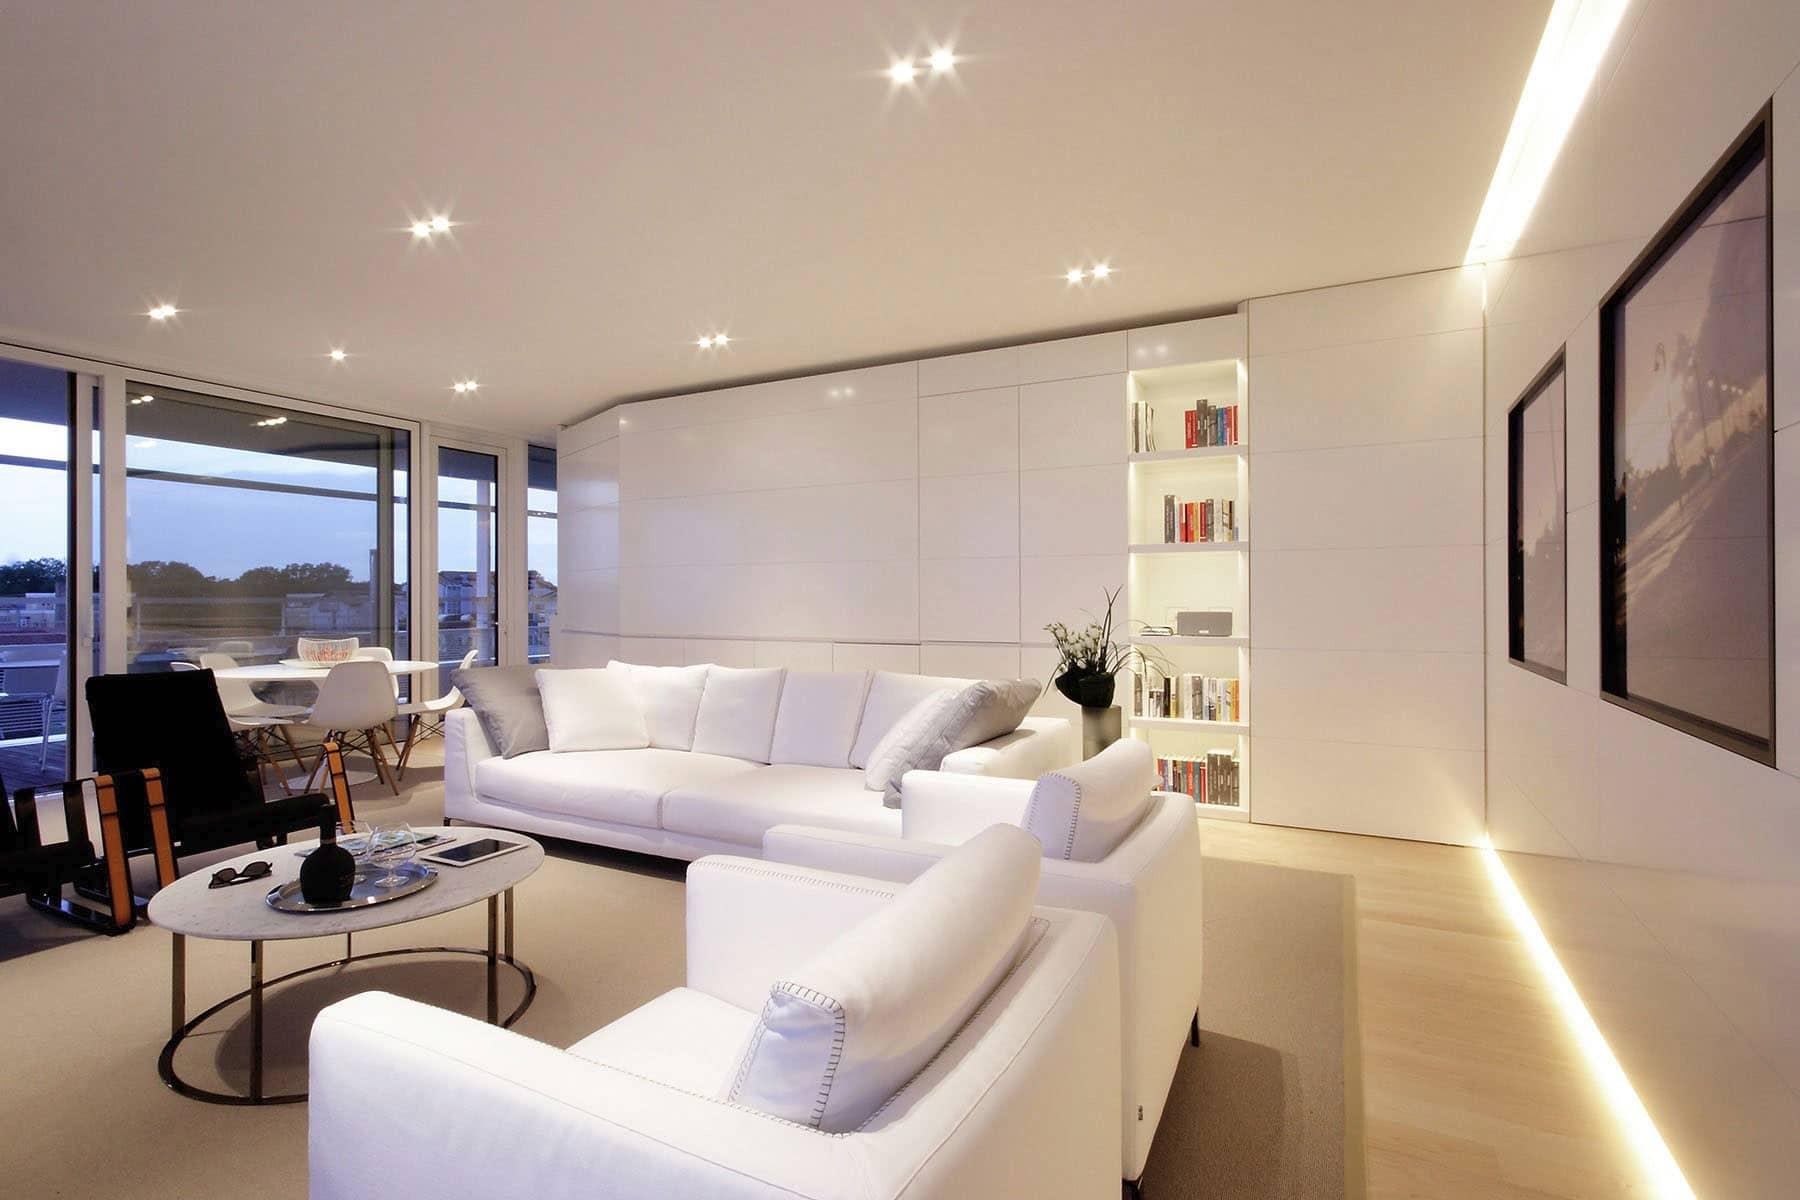 Plano departamento peque o dos dormitorios for Diseno de interiores apartamentos pequenos